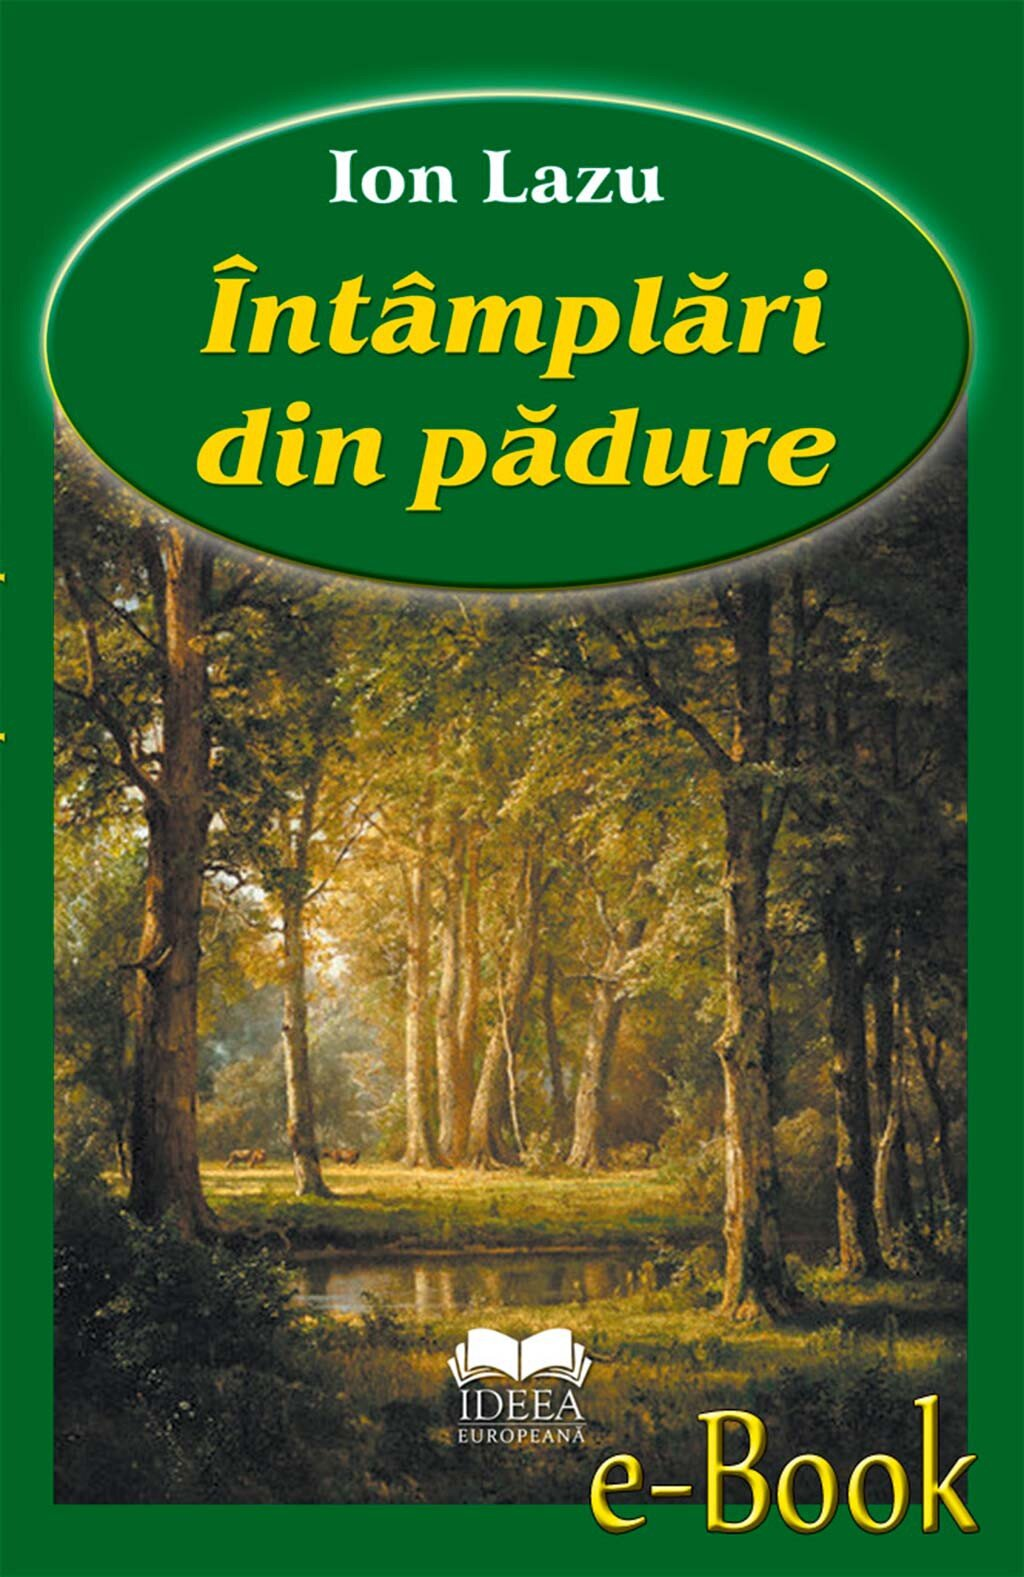 Intamplari din padure (eBook)